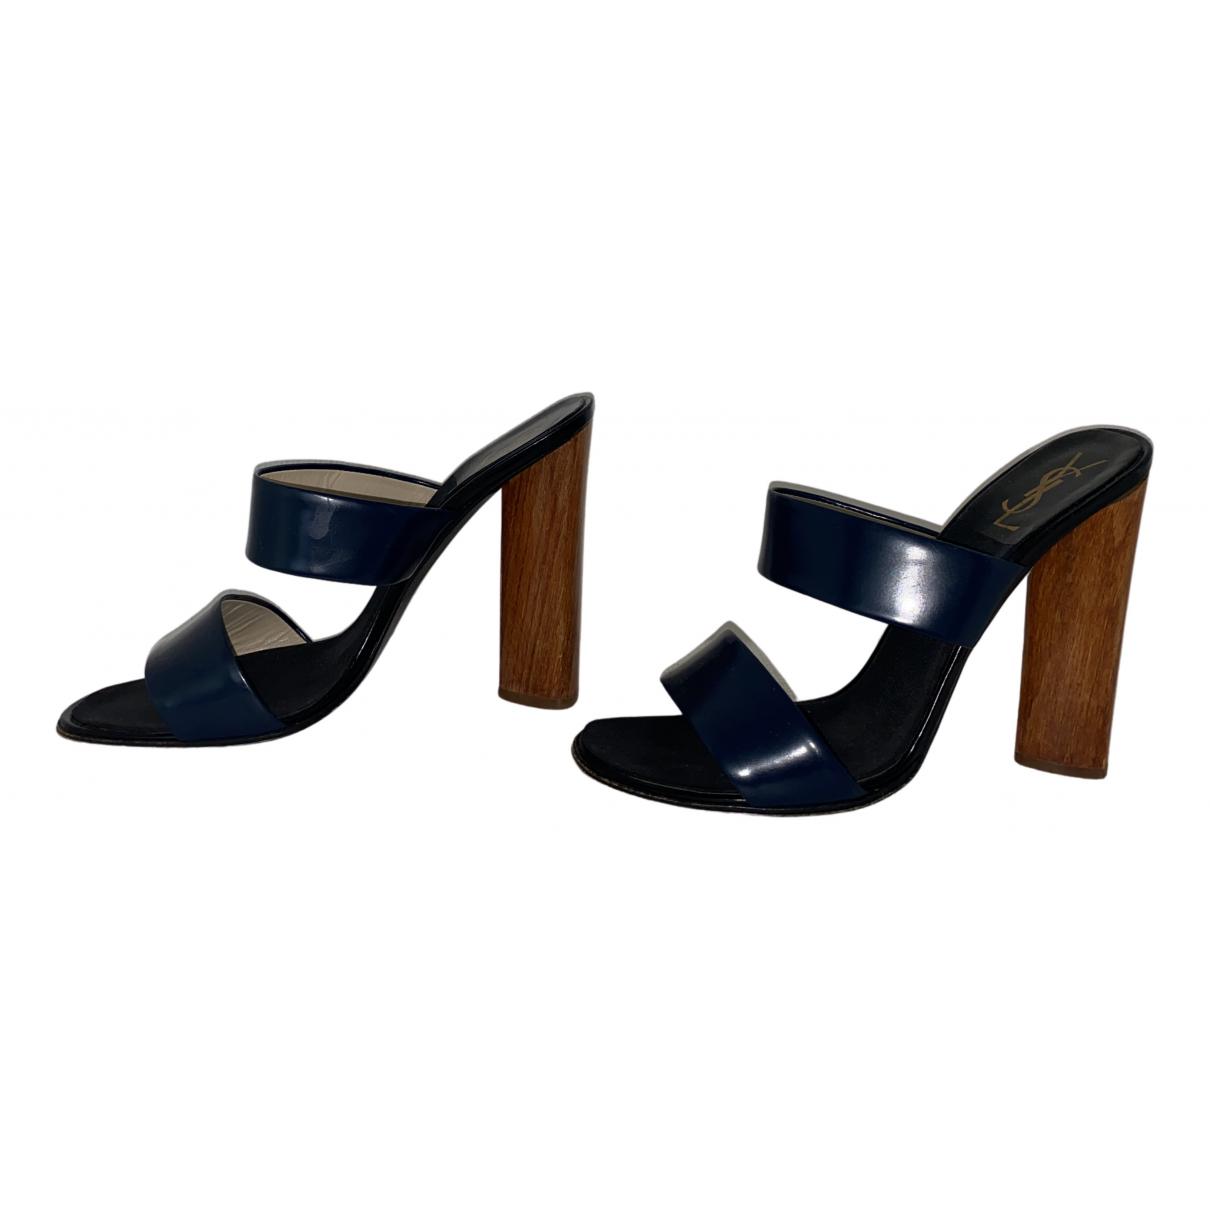 Yves Saint Laurent N Navy Leather Sandals for Women 40 EU